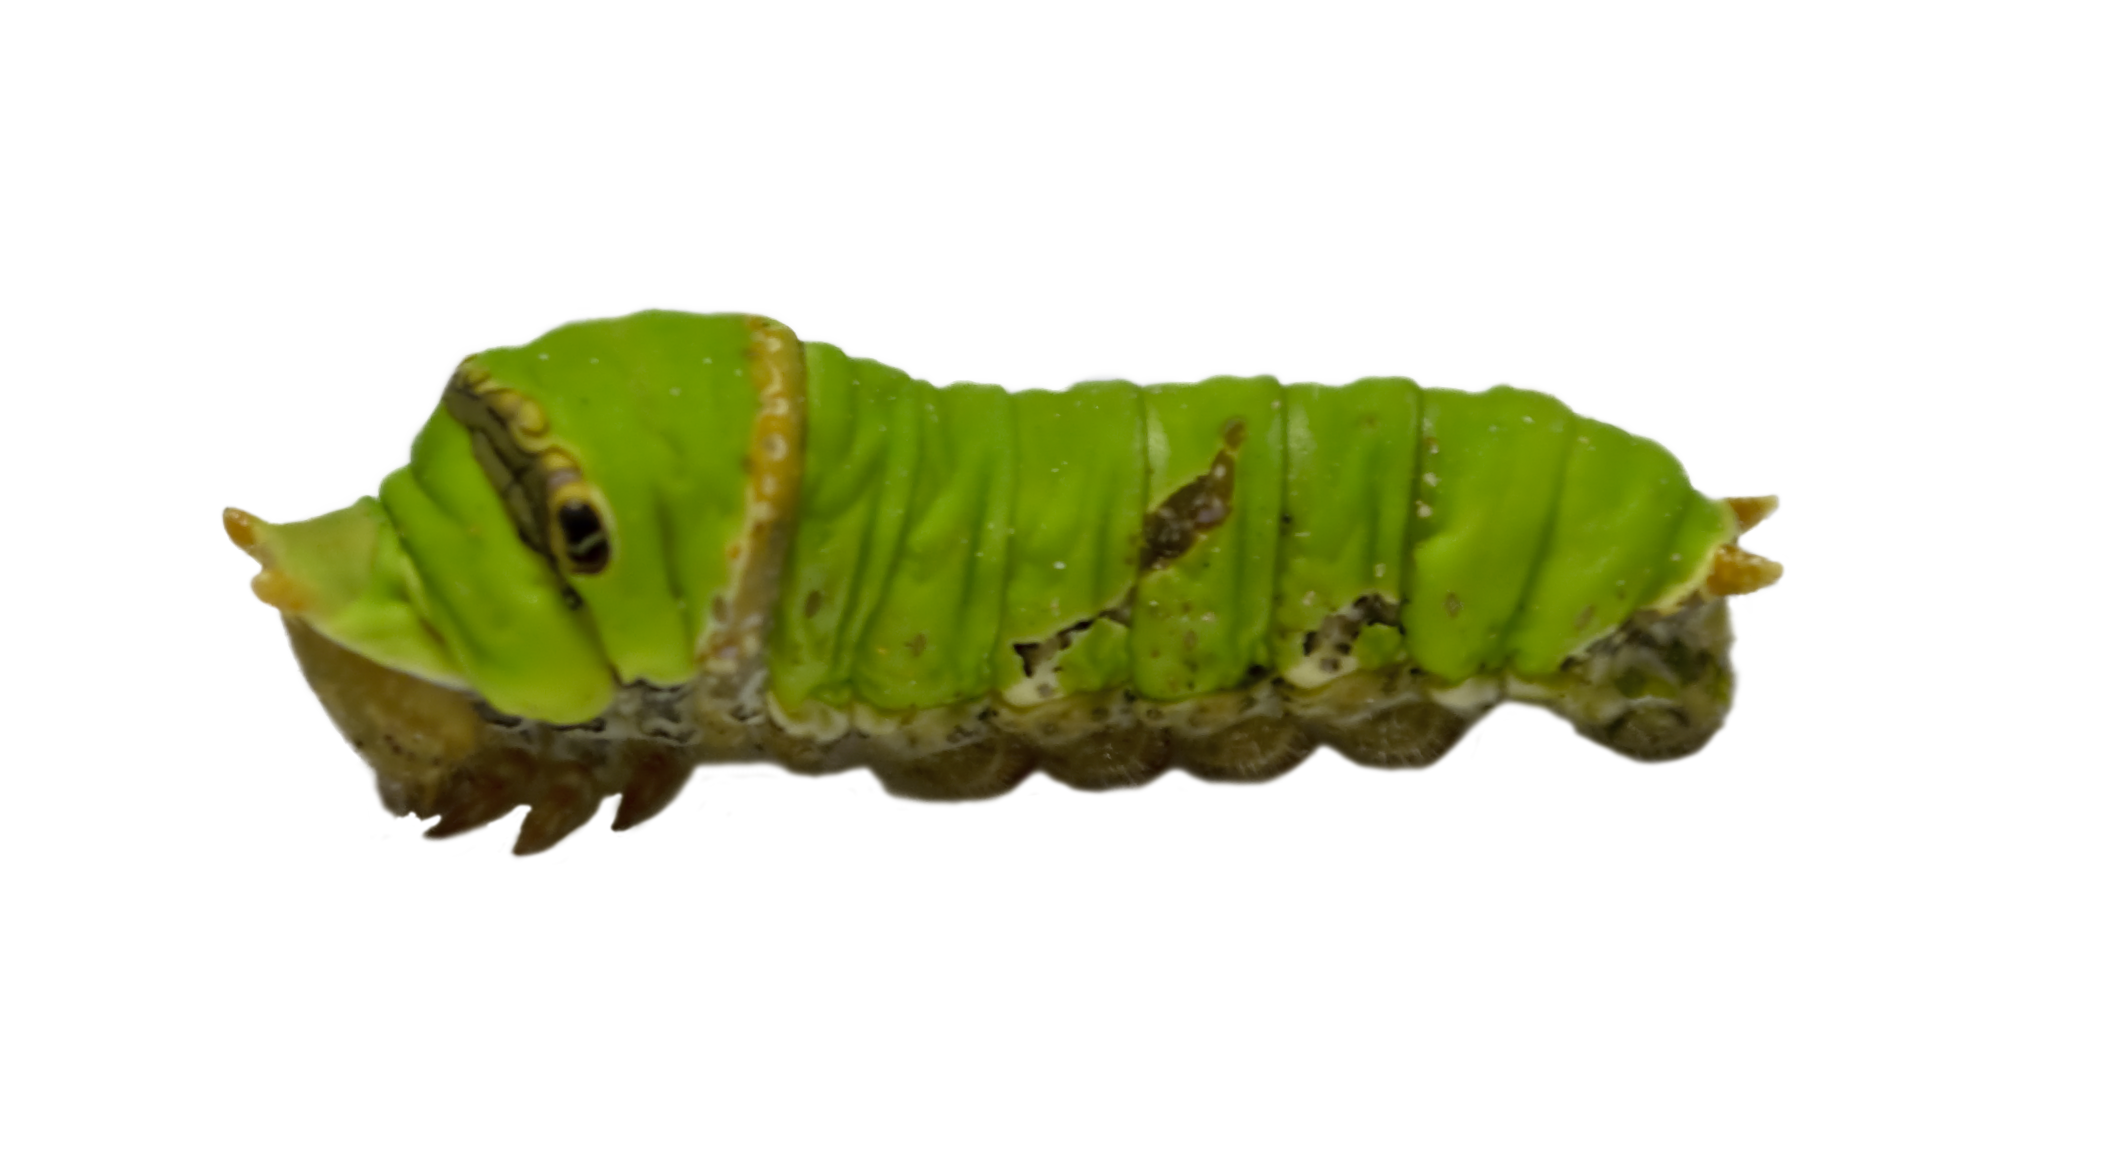 Caterpillar Stock By Mrhighsky Caterpillar Stock By Mrhighsky - Caterpillar, Transparent background PNG HD thumbnail